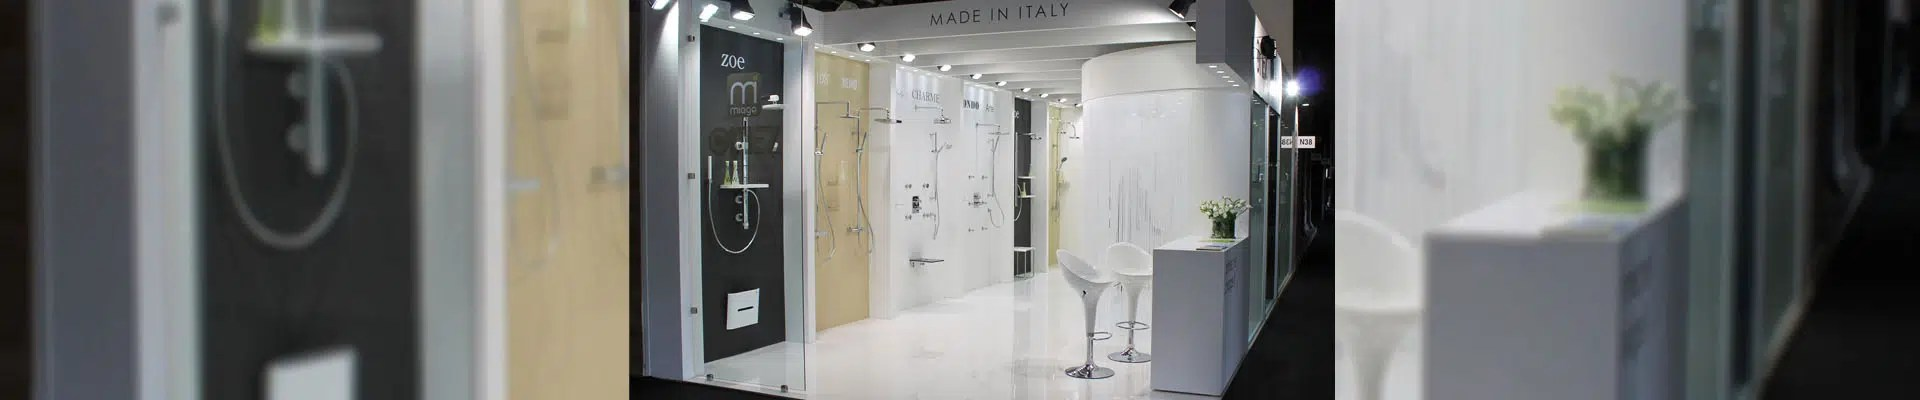 STAND-Lacee-Allestimenti-Stand-Fieristici-Milano-02